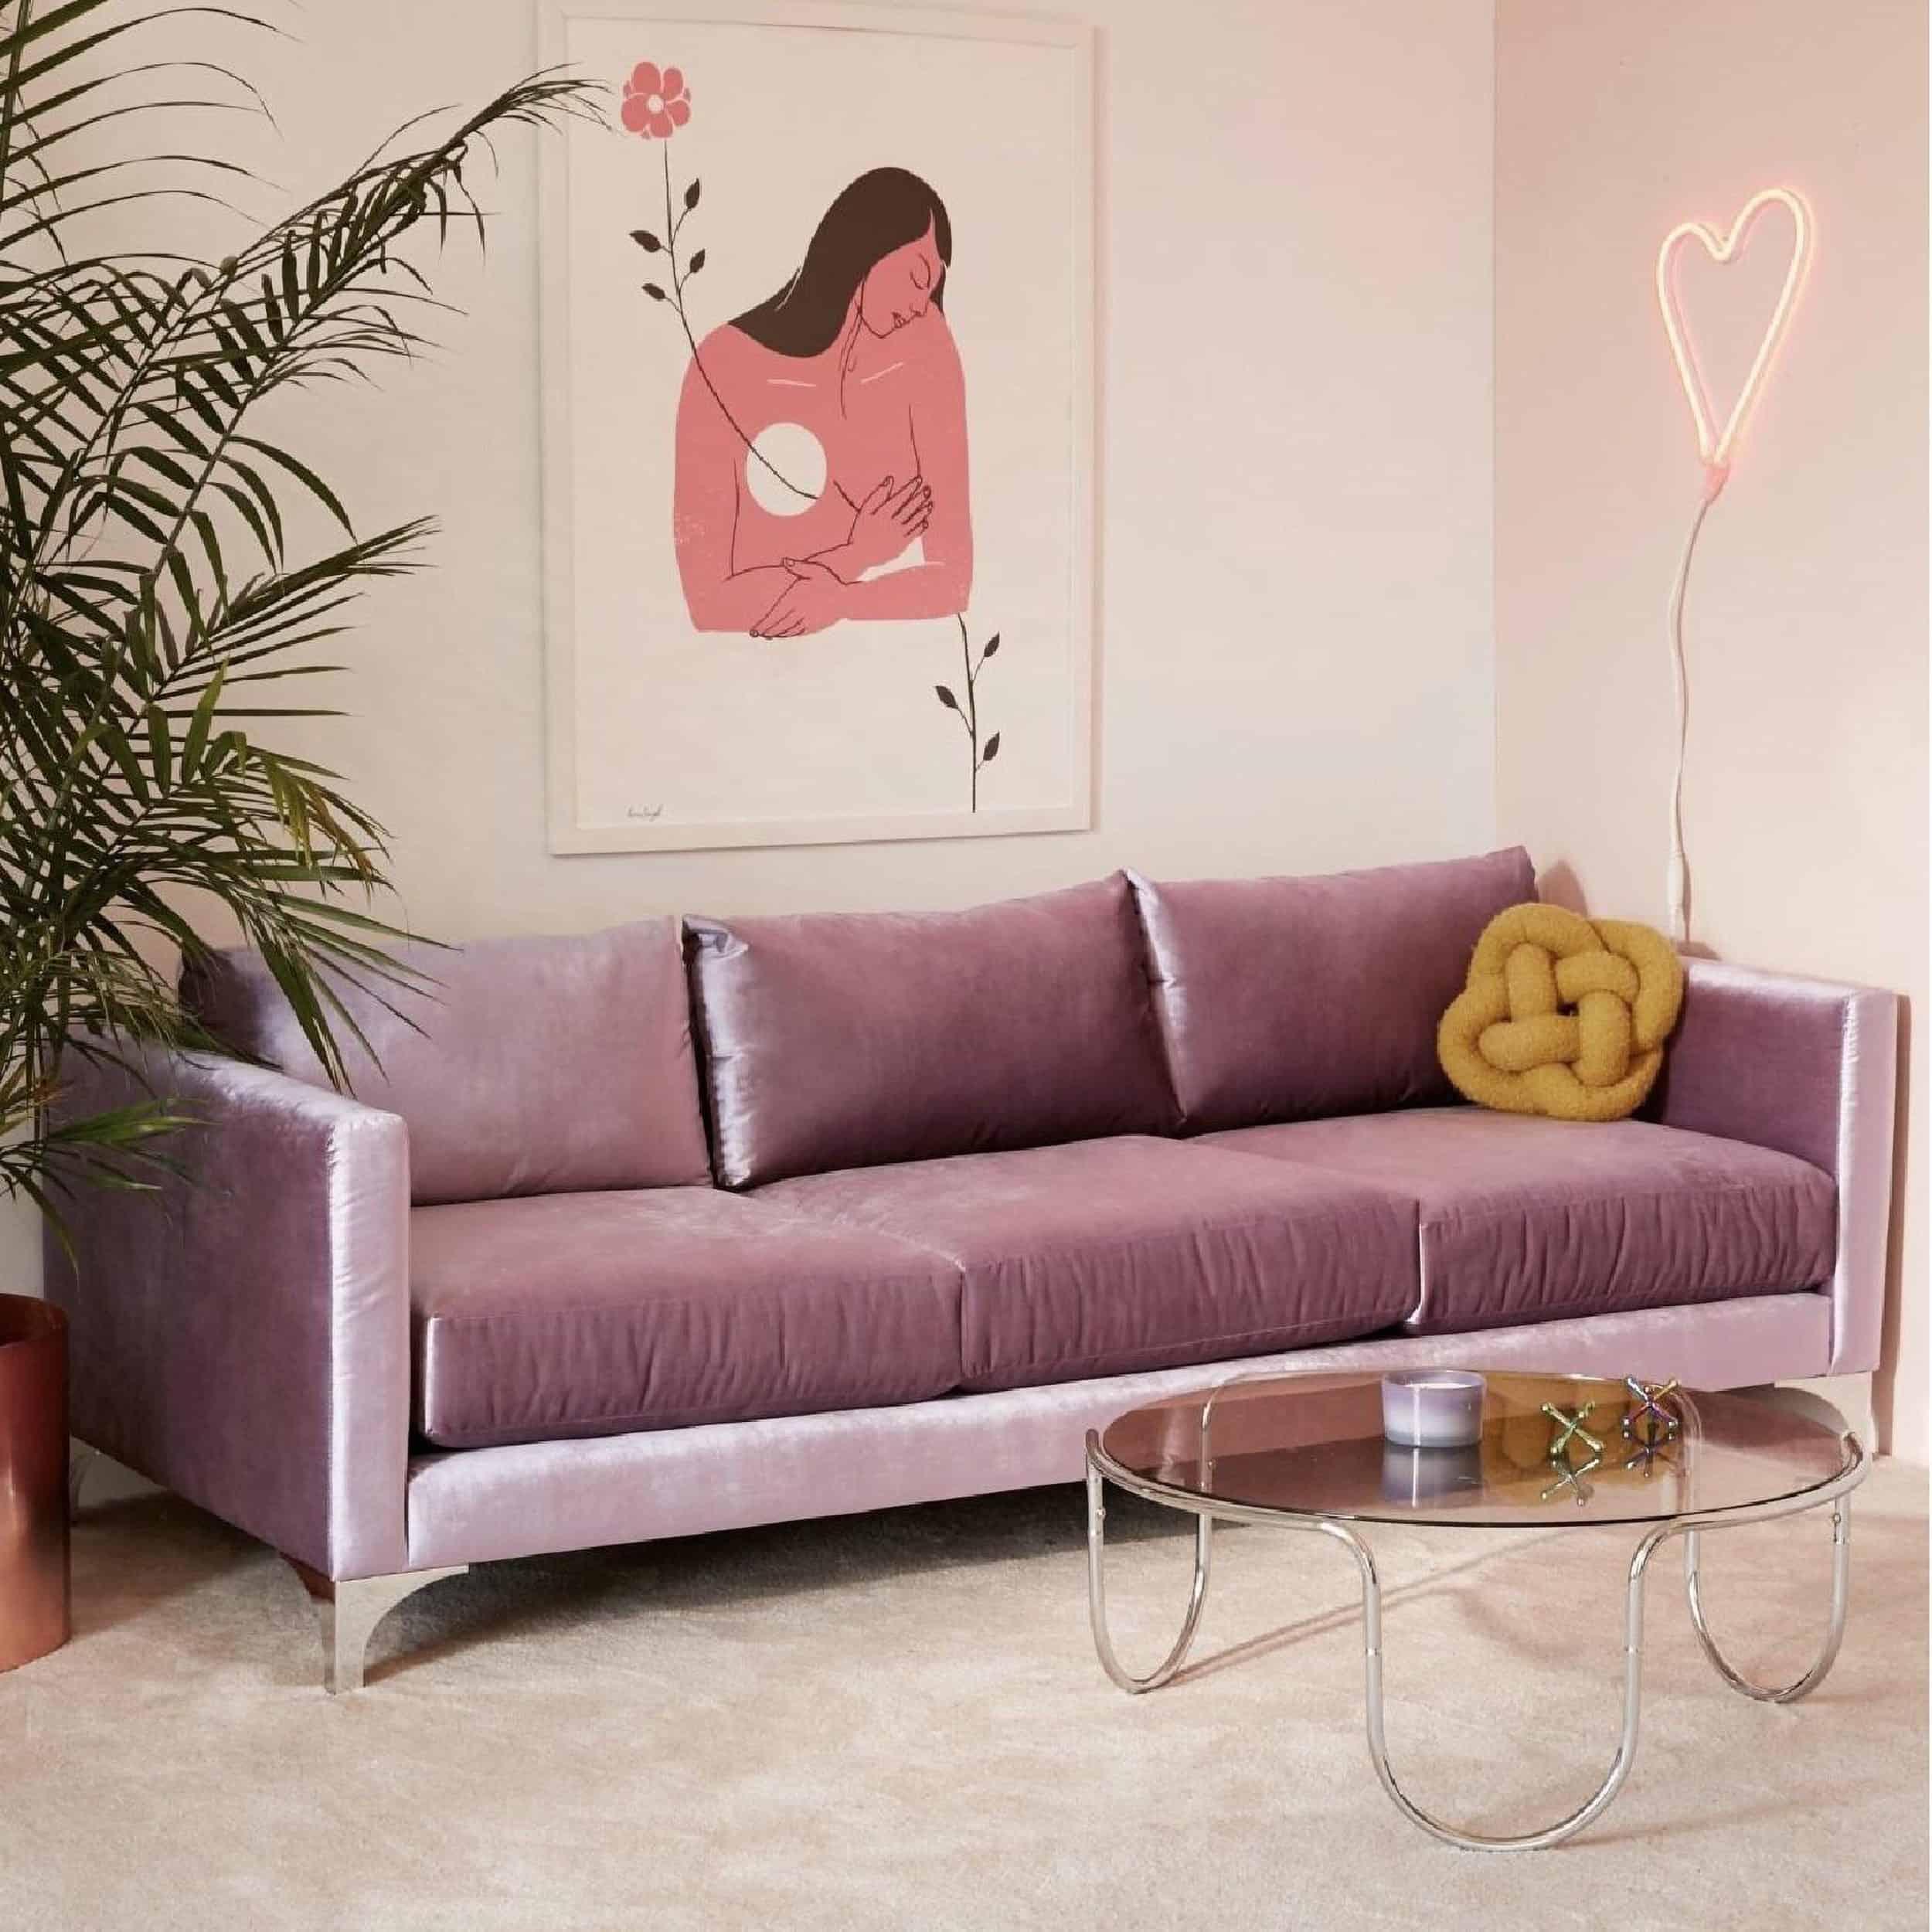 Emily Henderson Design Trends 2018 Modern Lilac 3 1